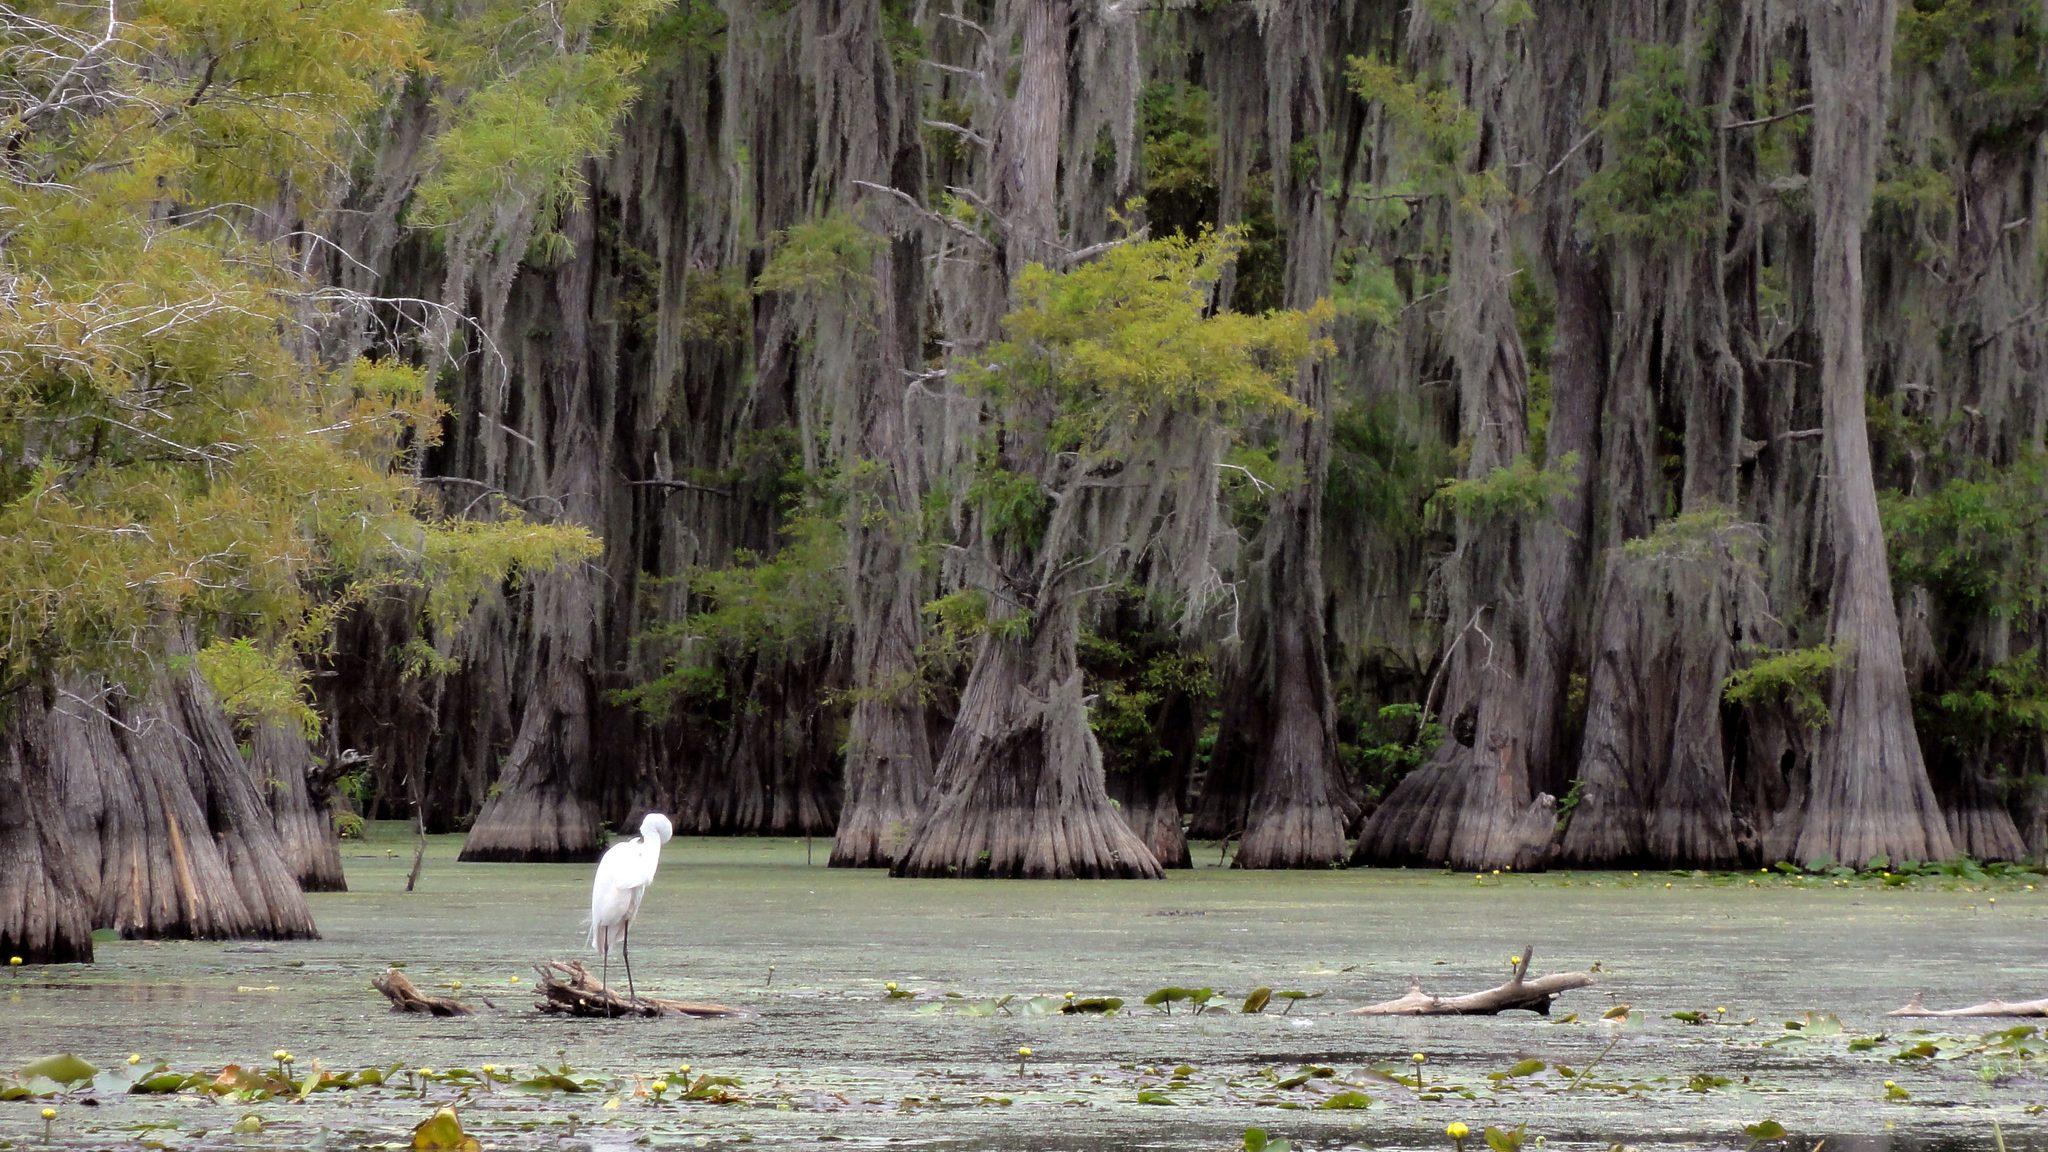 Image: White Egret on